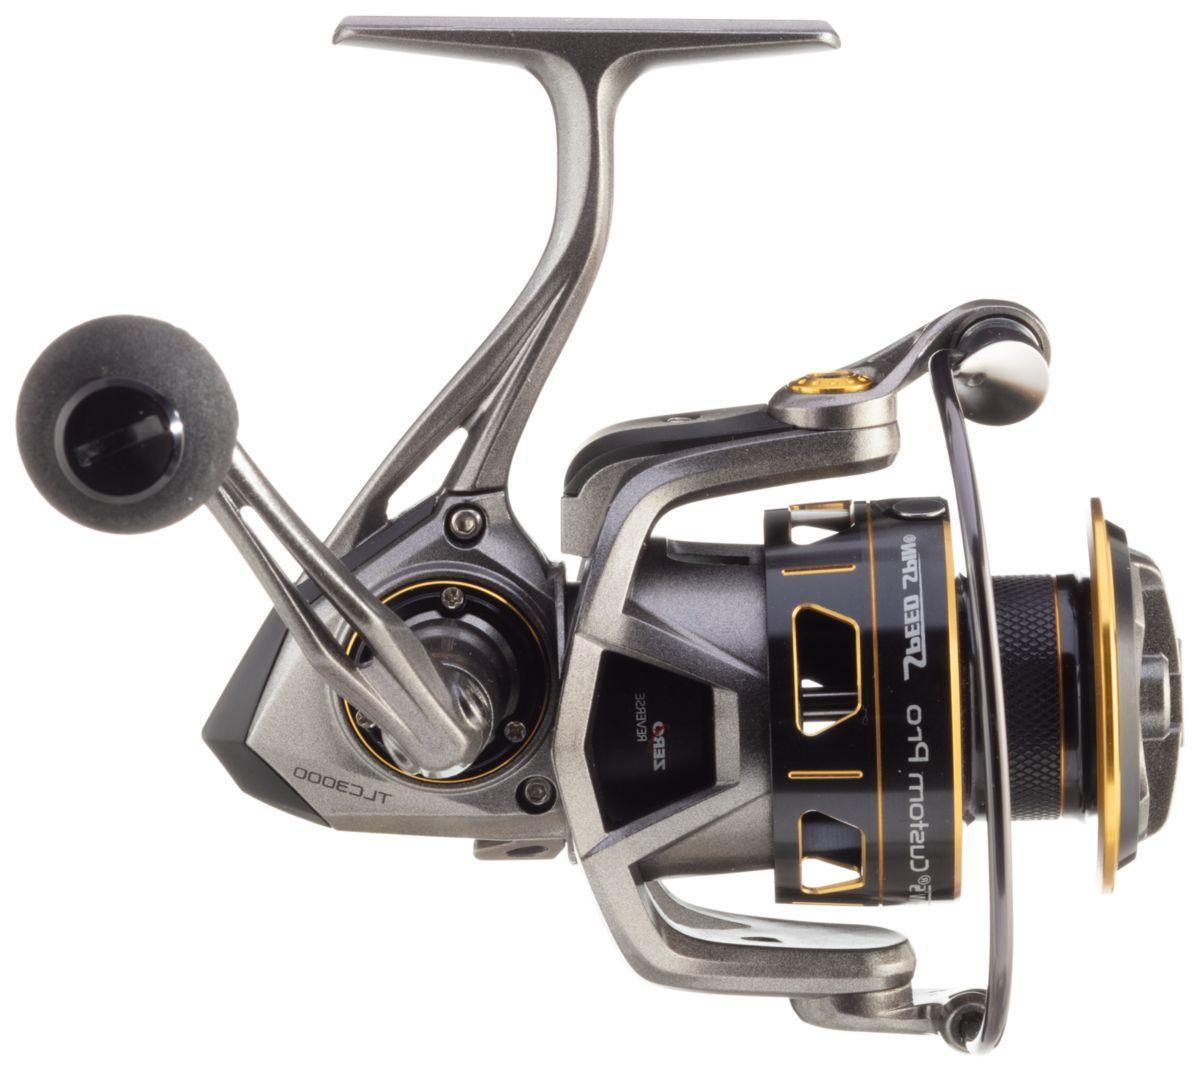 Team Lew's® Custom Pro Speed Spin® Spinning Reel